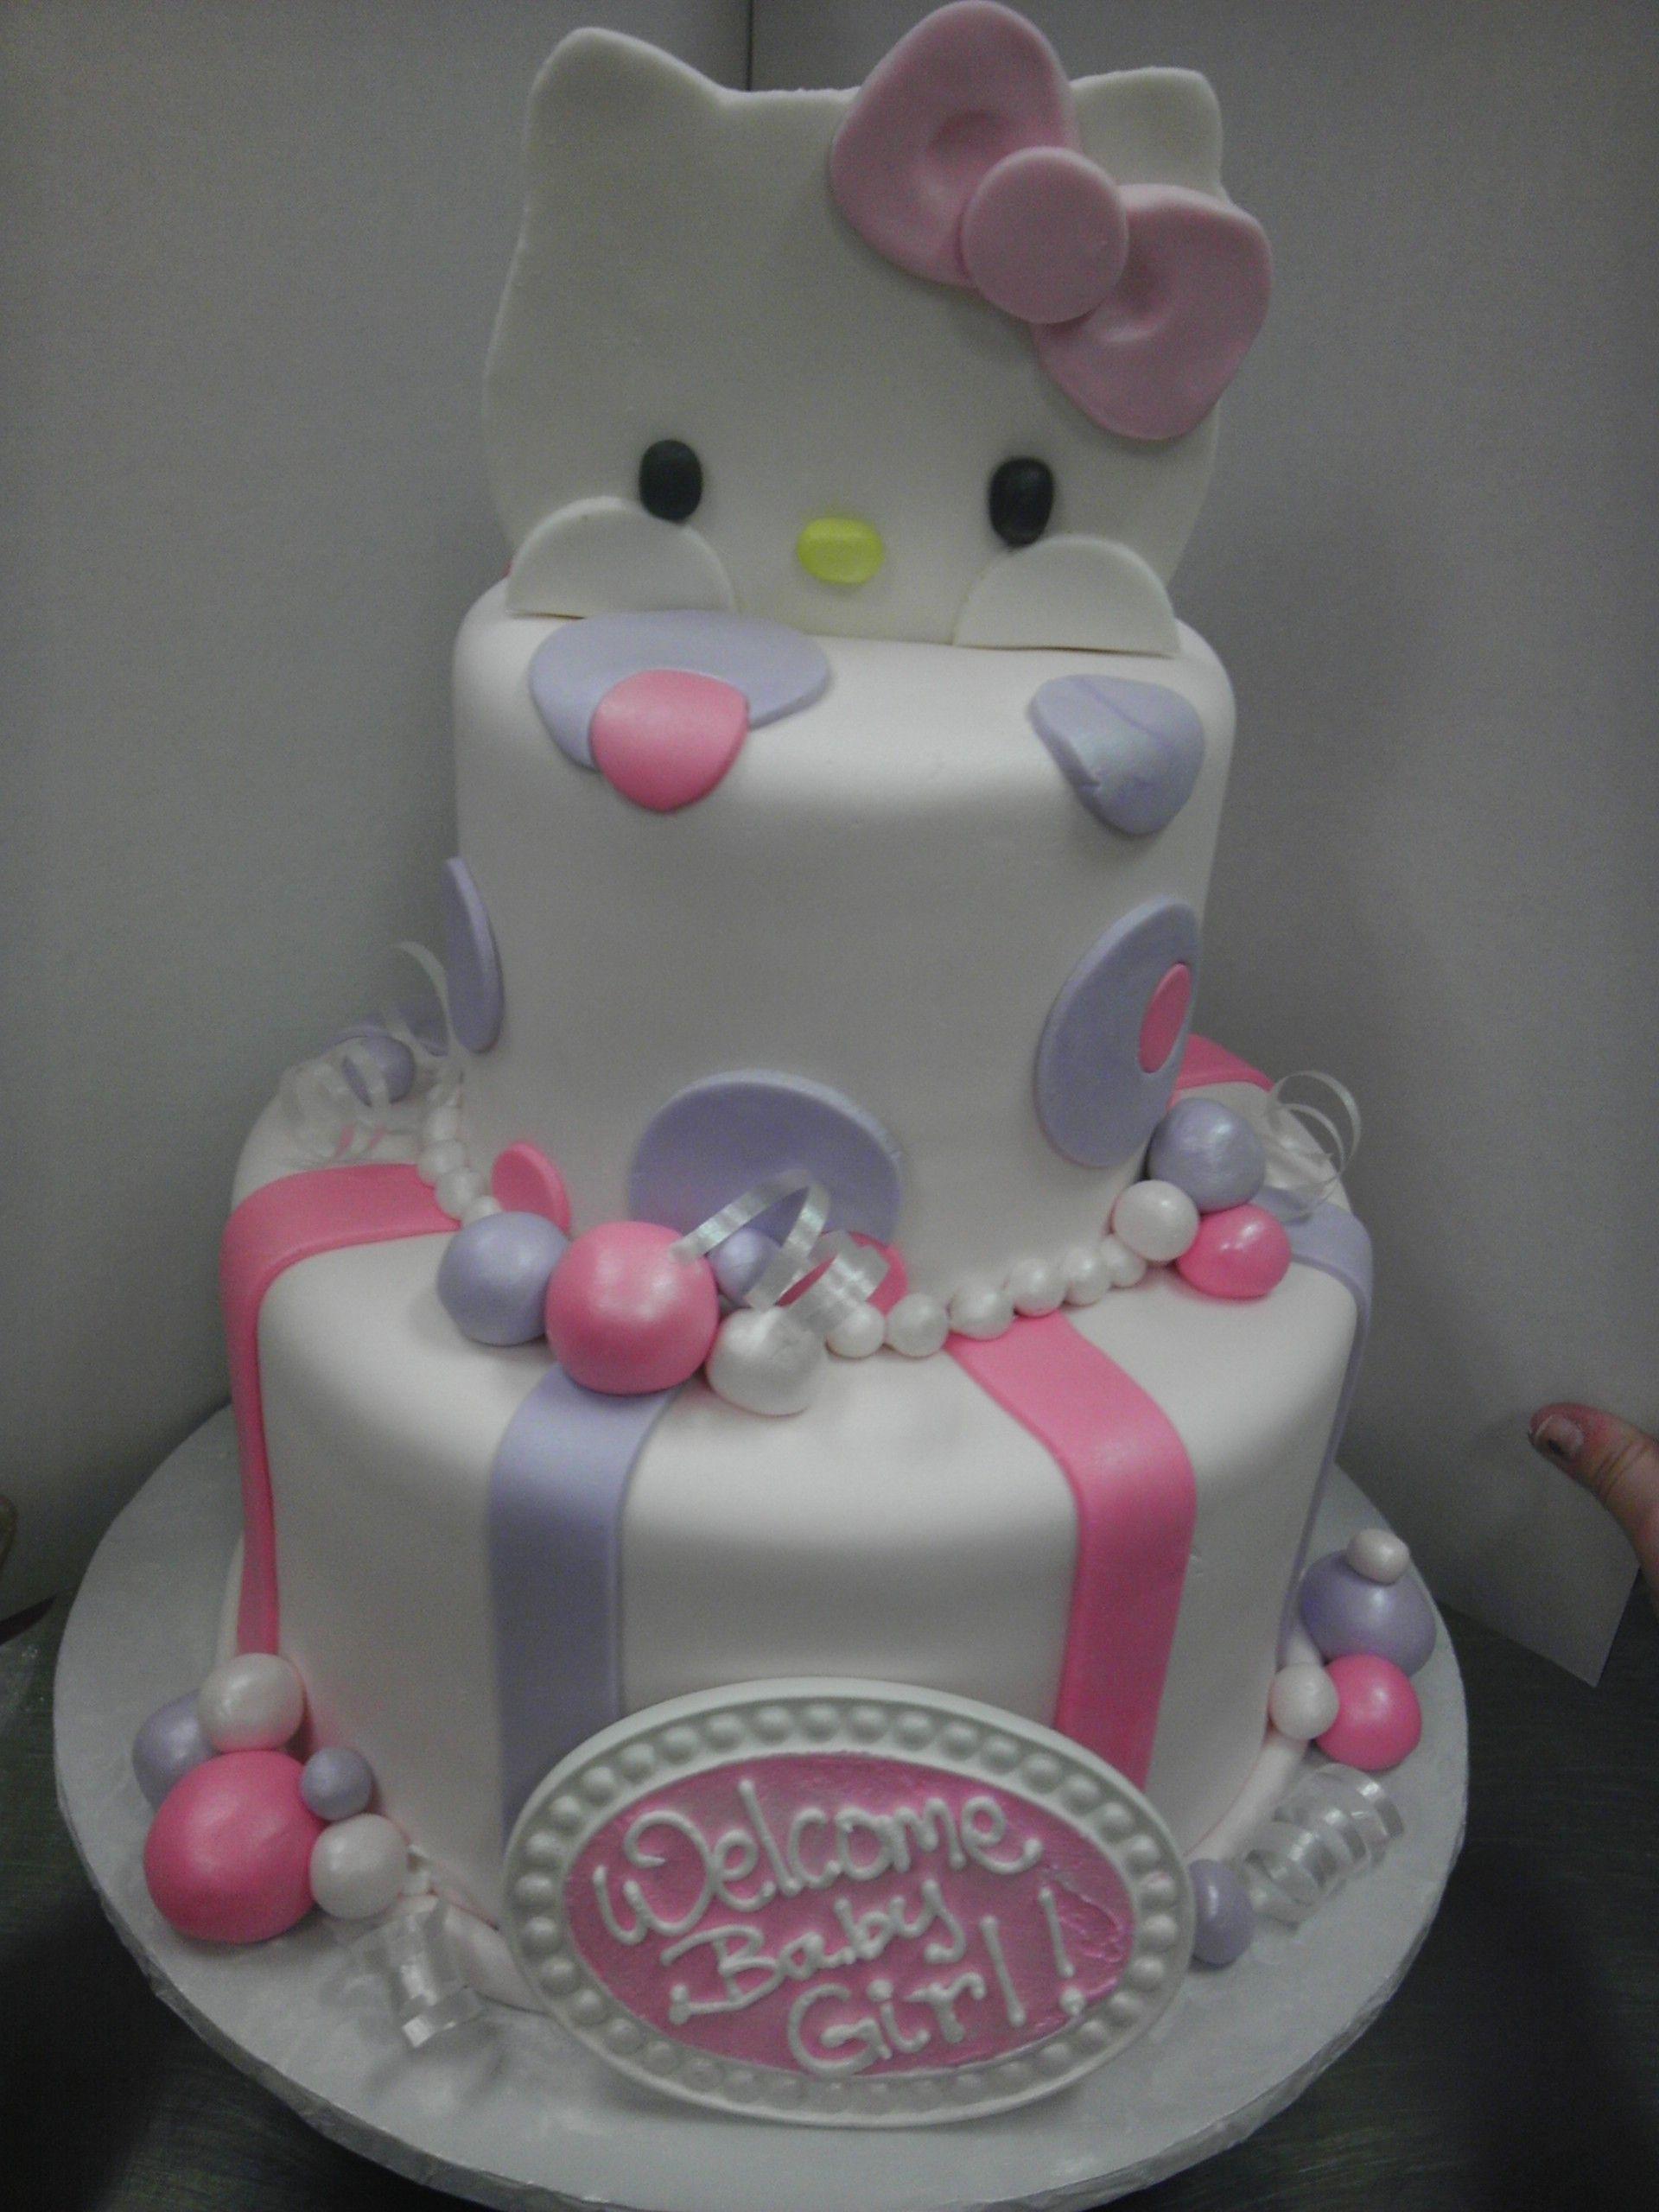 Hello Kitty Baby Shower Cake : hello, kitty, shower, Marie, Brault, Cakes, Hello, Kitty, Shower,, Baby,, Shower, Decorations